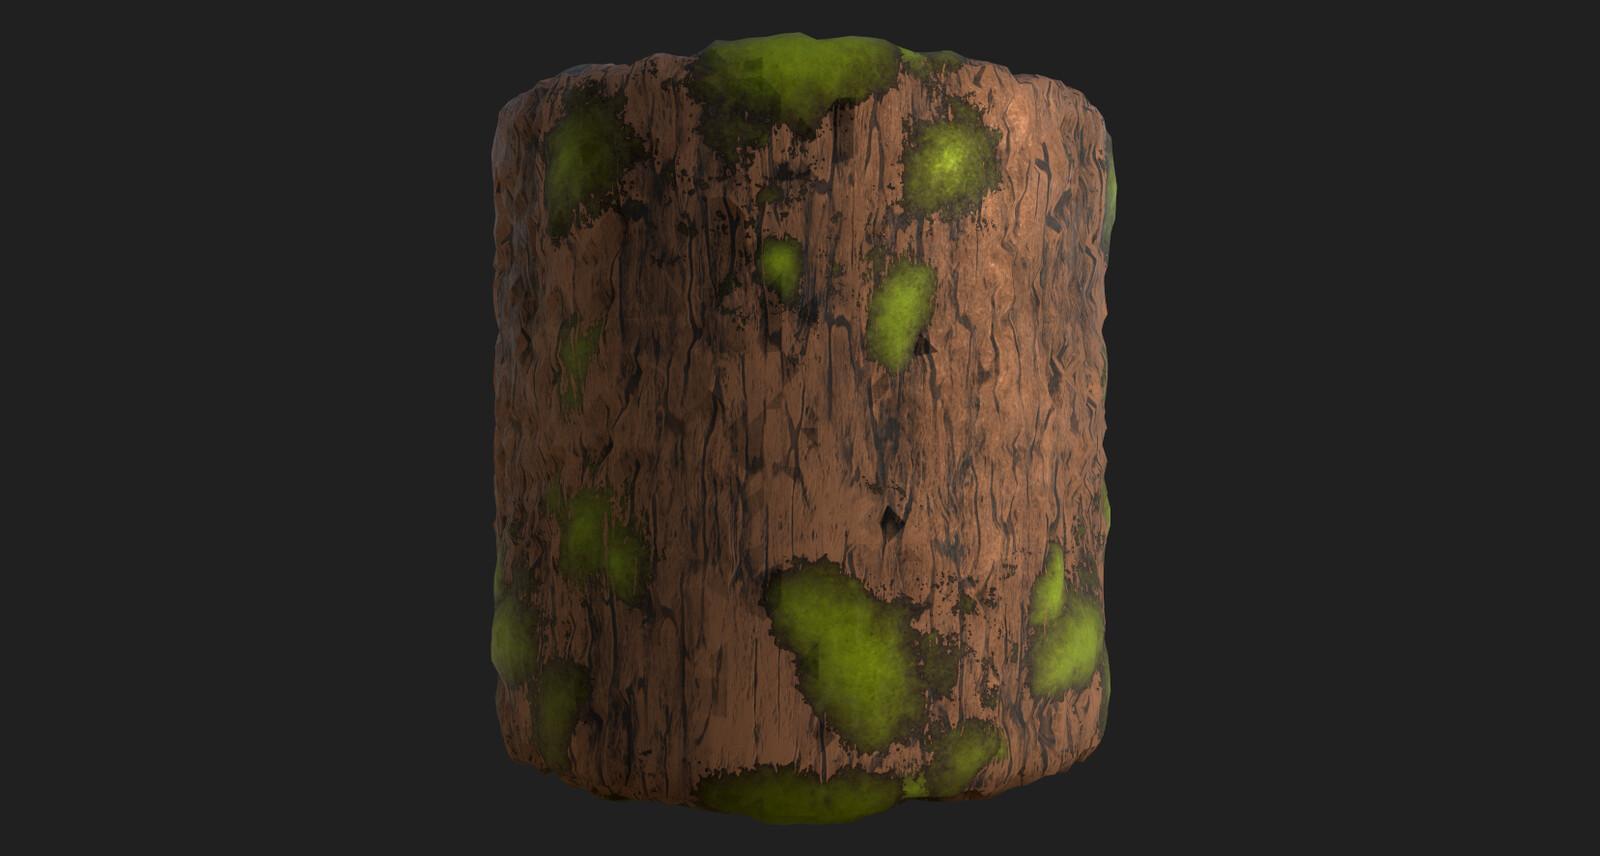 Stylized mossy wood